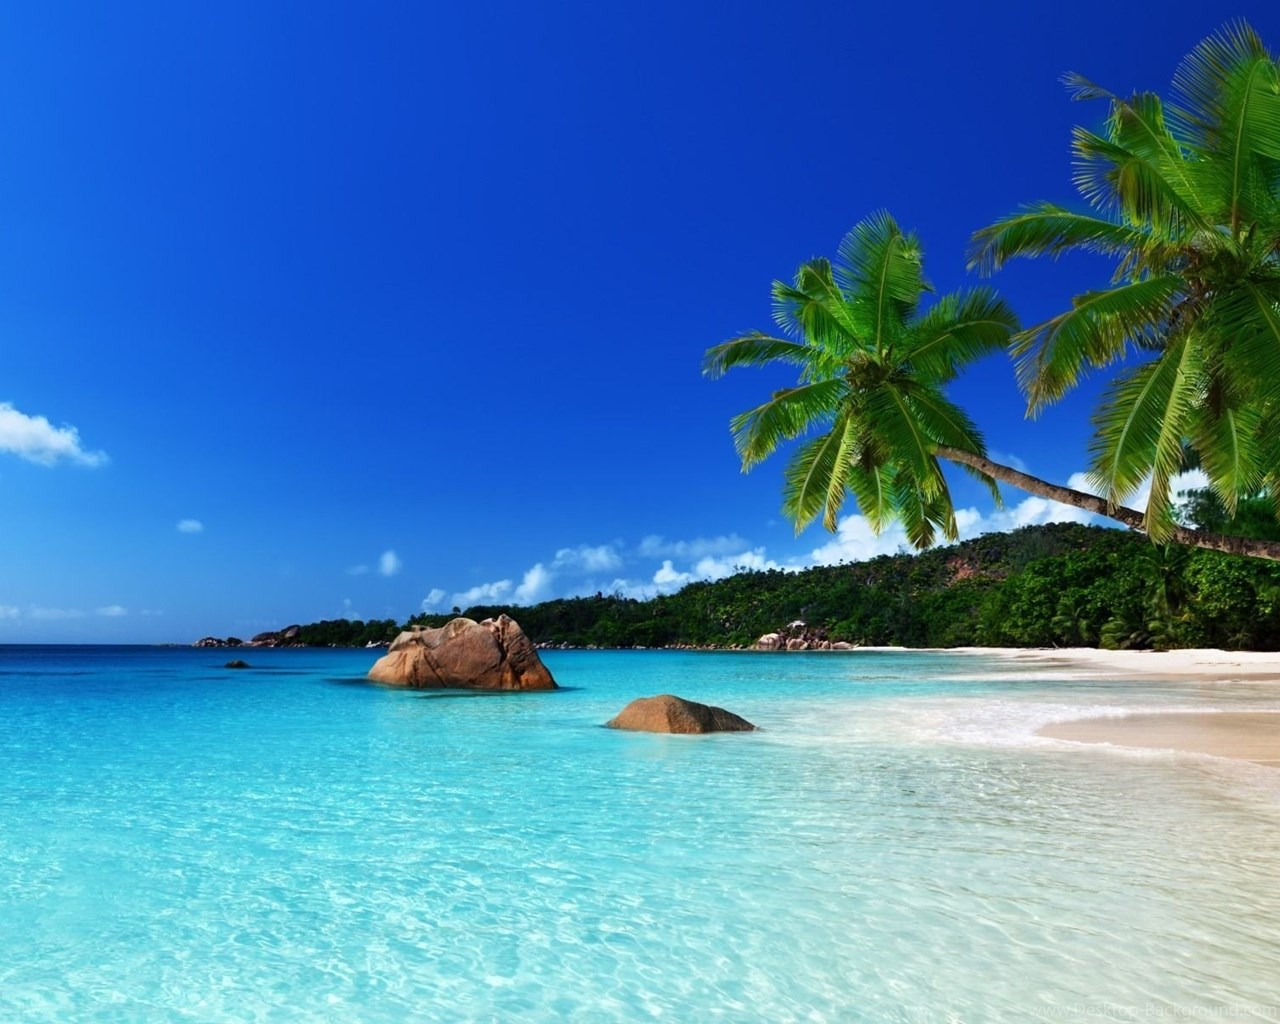 Tropical island Computer Wallpapers Desktop Backgrounds 1280x1024